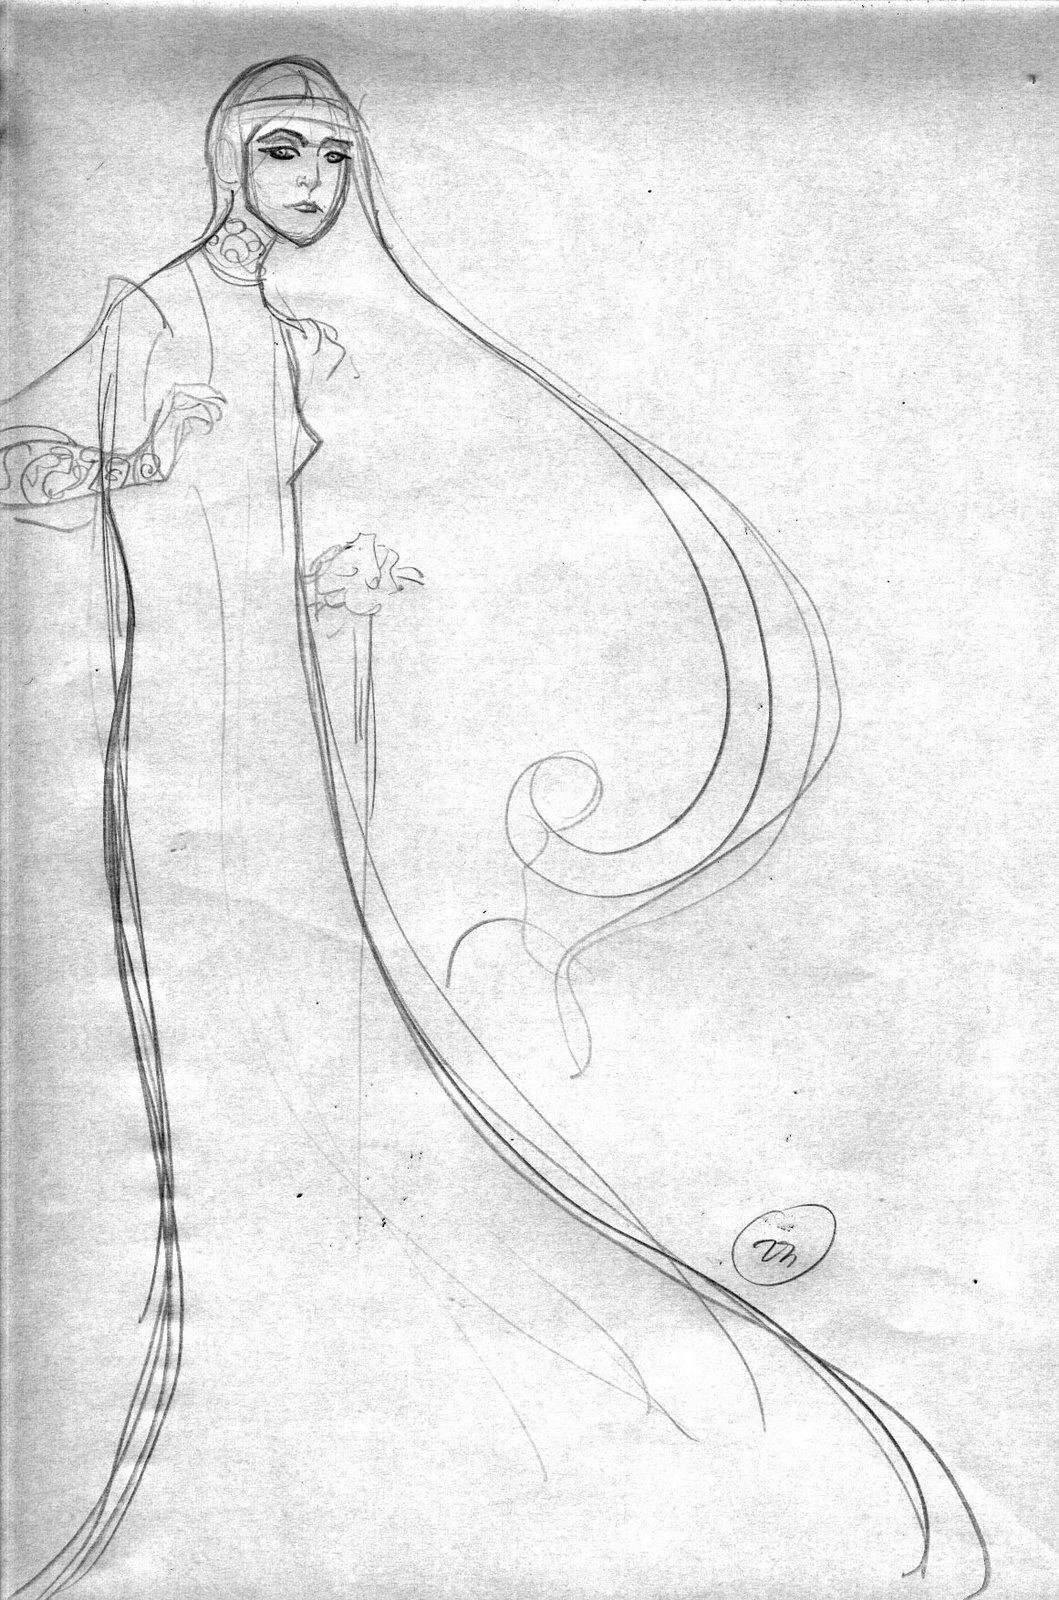 [Walt Disney] La Reine des Neiges (2013) - Sujet d'avant-sortie - Page 39 23-Kopie